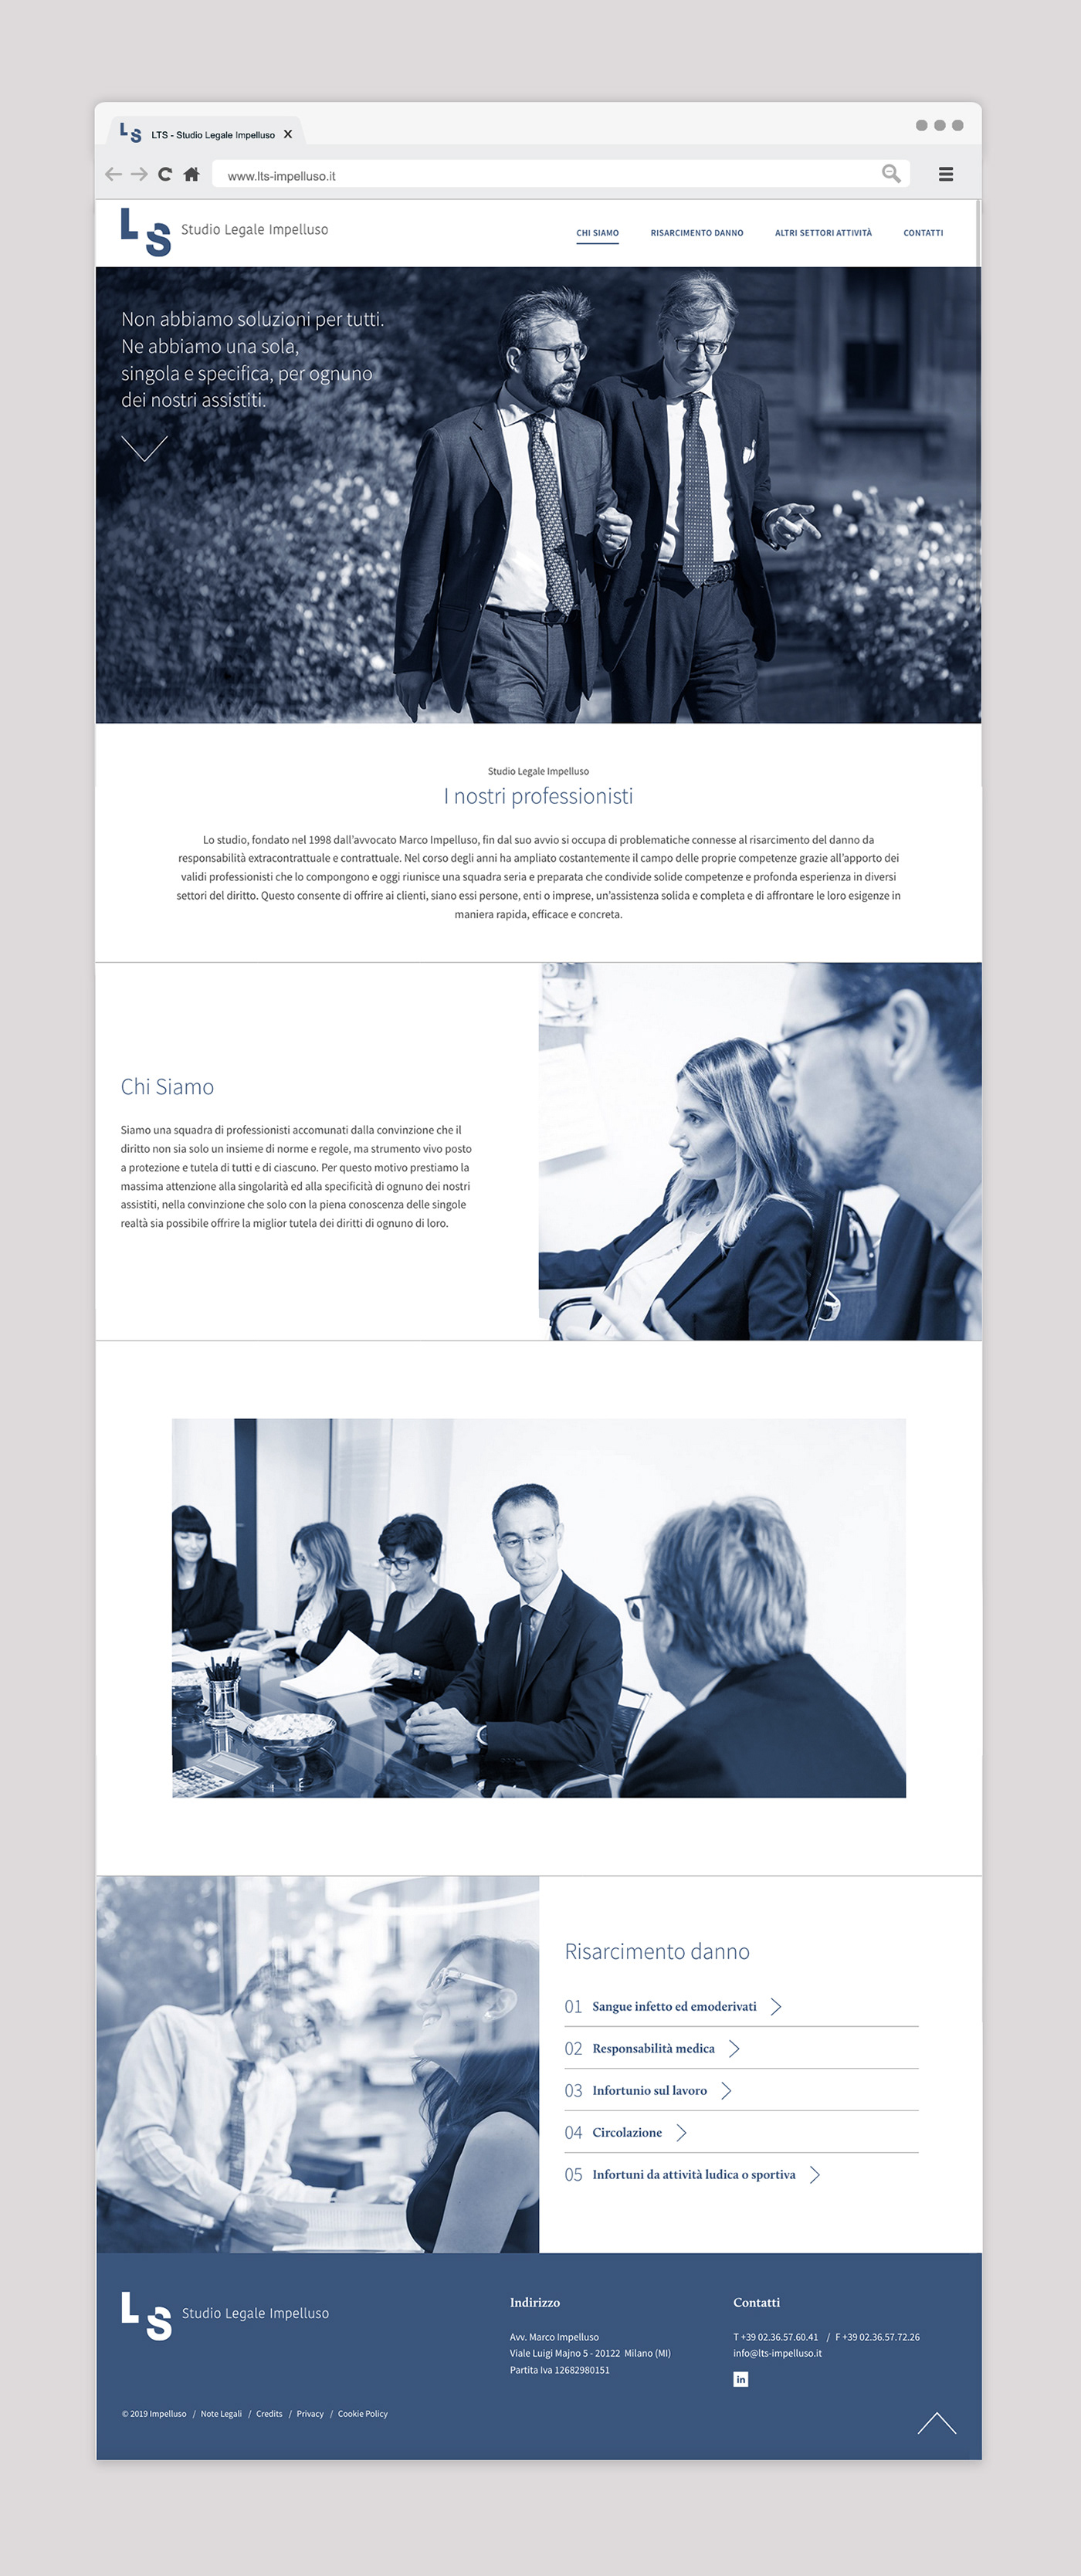 Website graphic design  UX design ui design art direction  Photography  Creative Direction  Web photo studio legale